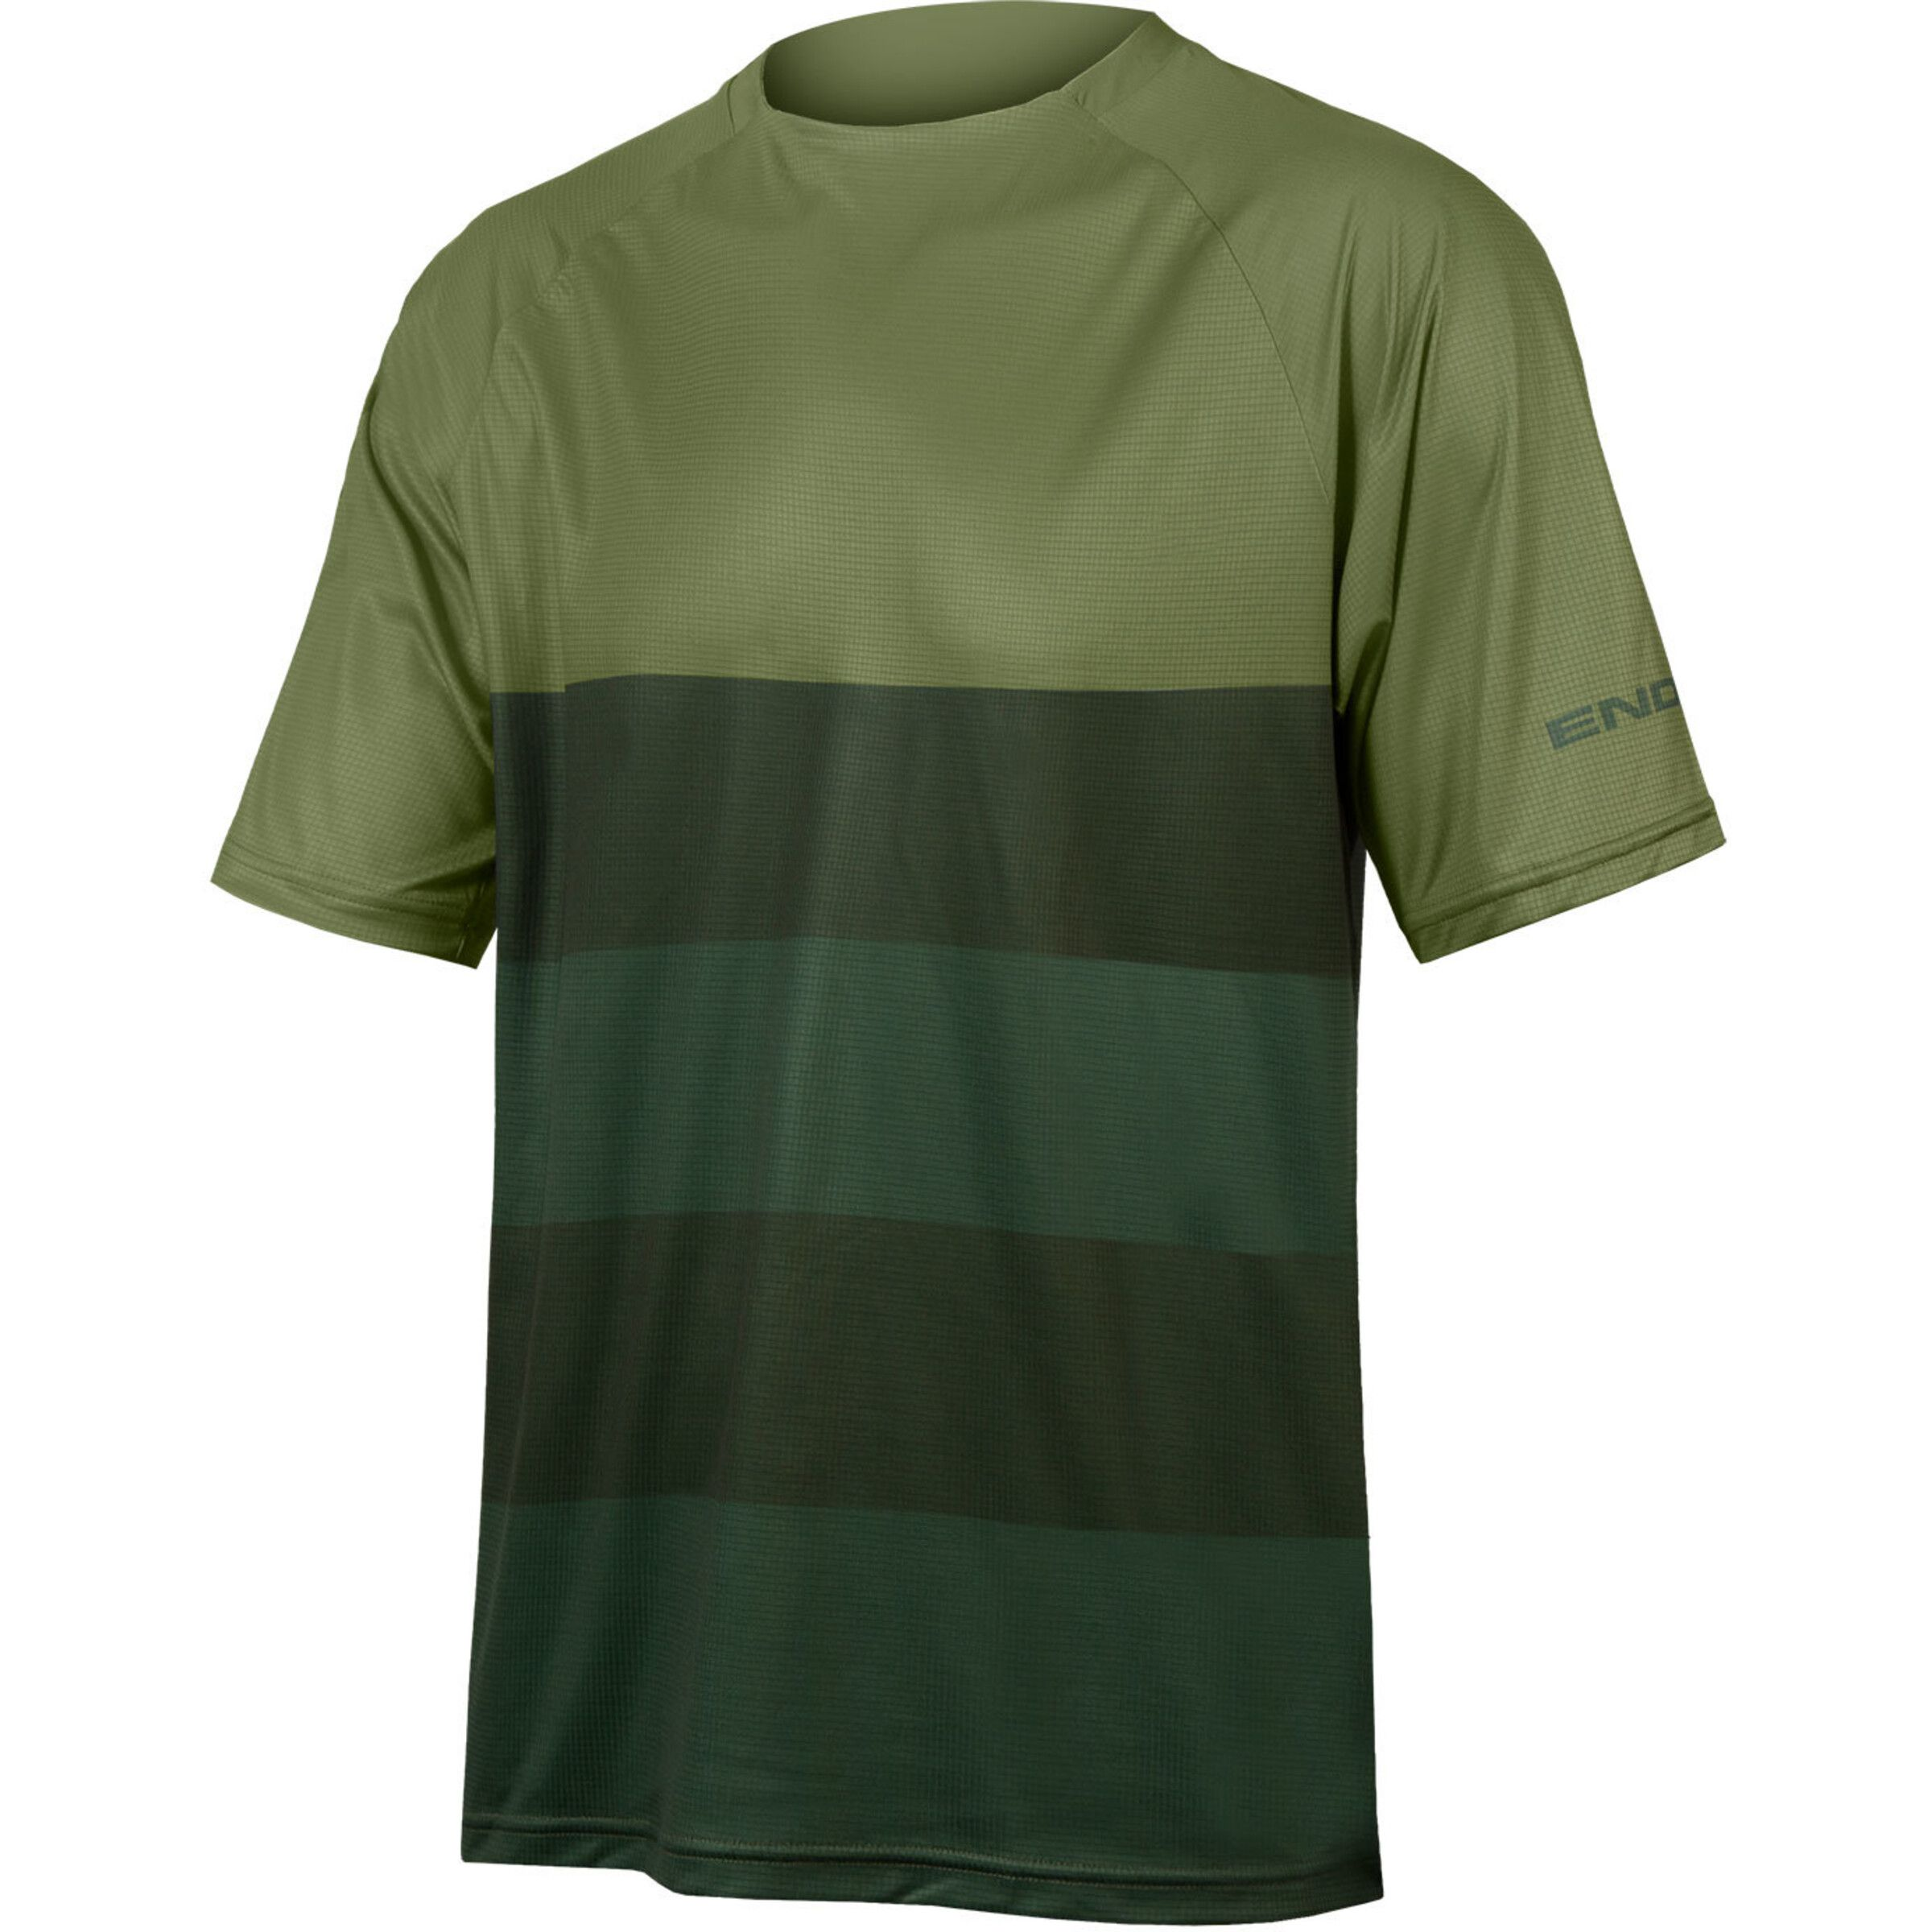 endura-singletrack-core-tee-men-olive-green-1.jpg